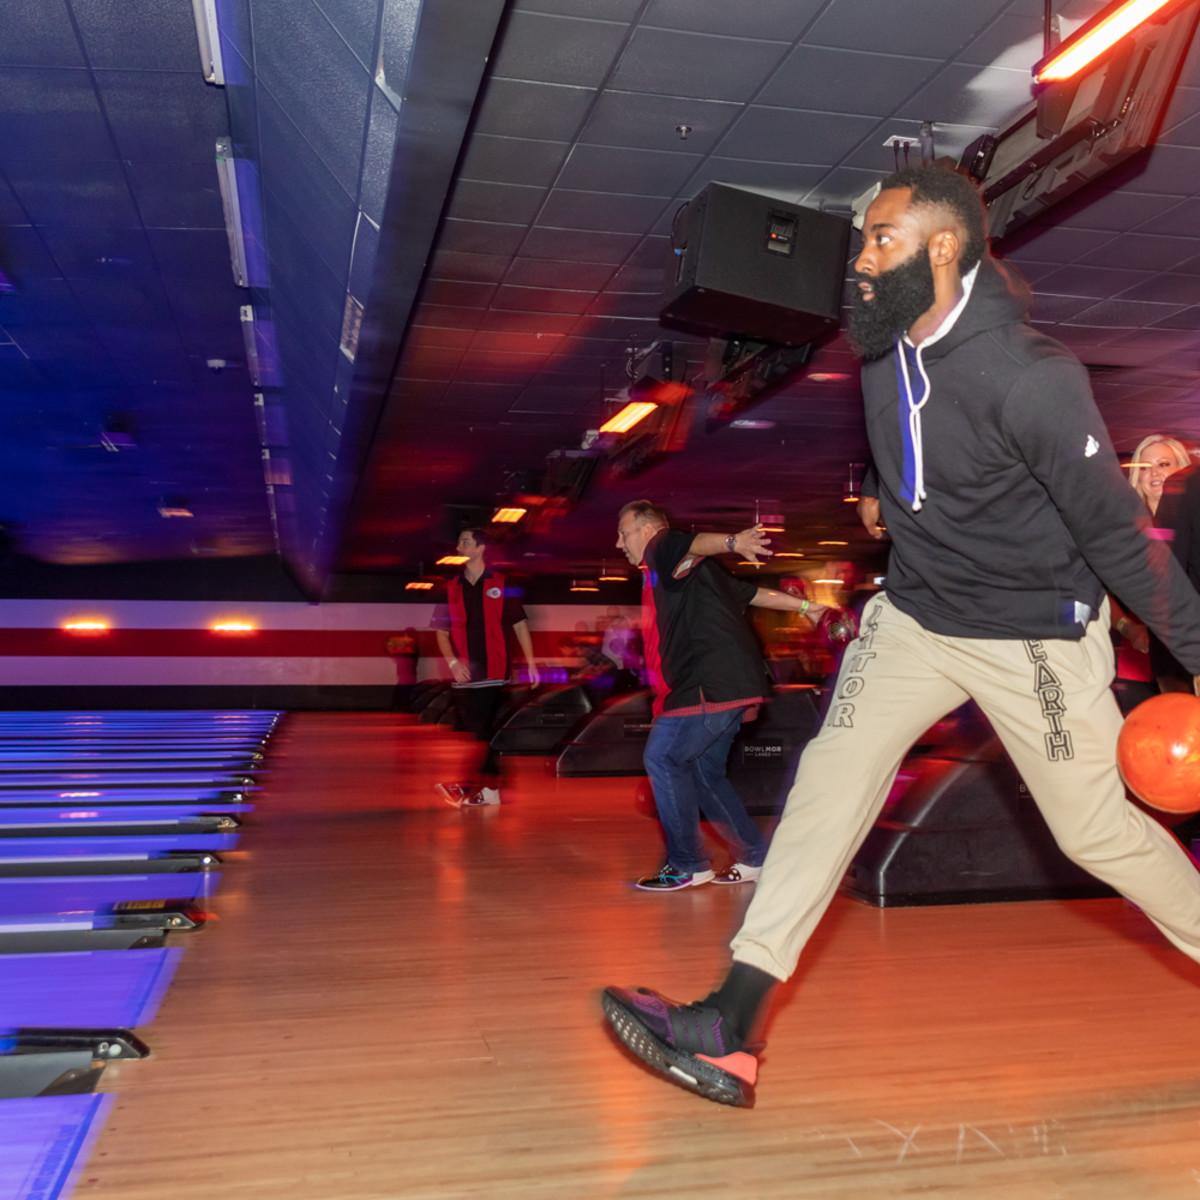 Clint Capela bowling bash 2019 James Harden bowling